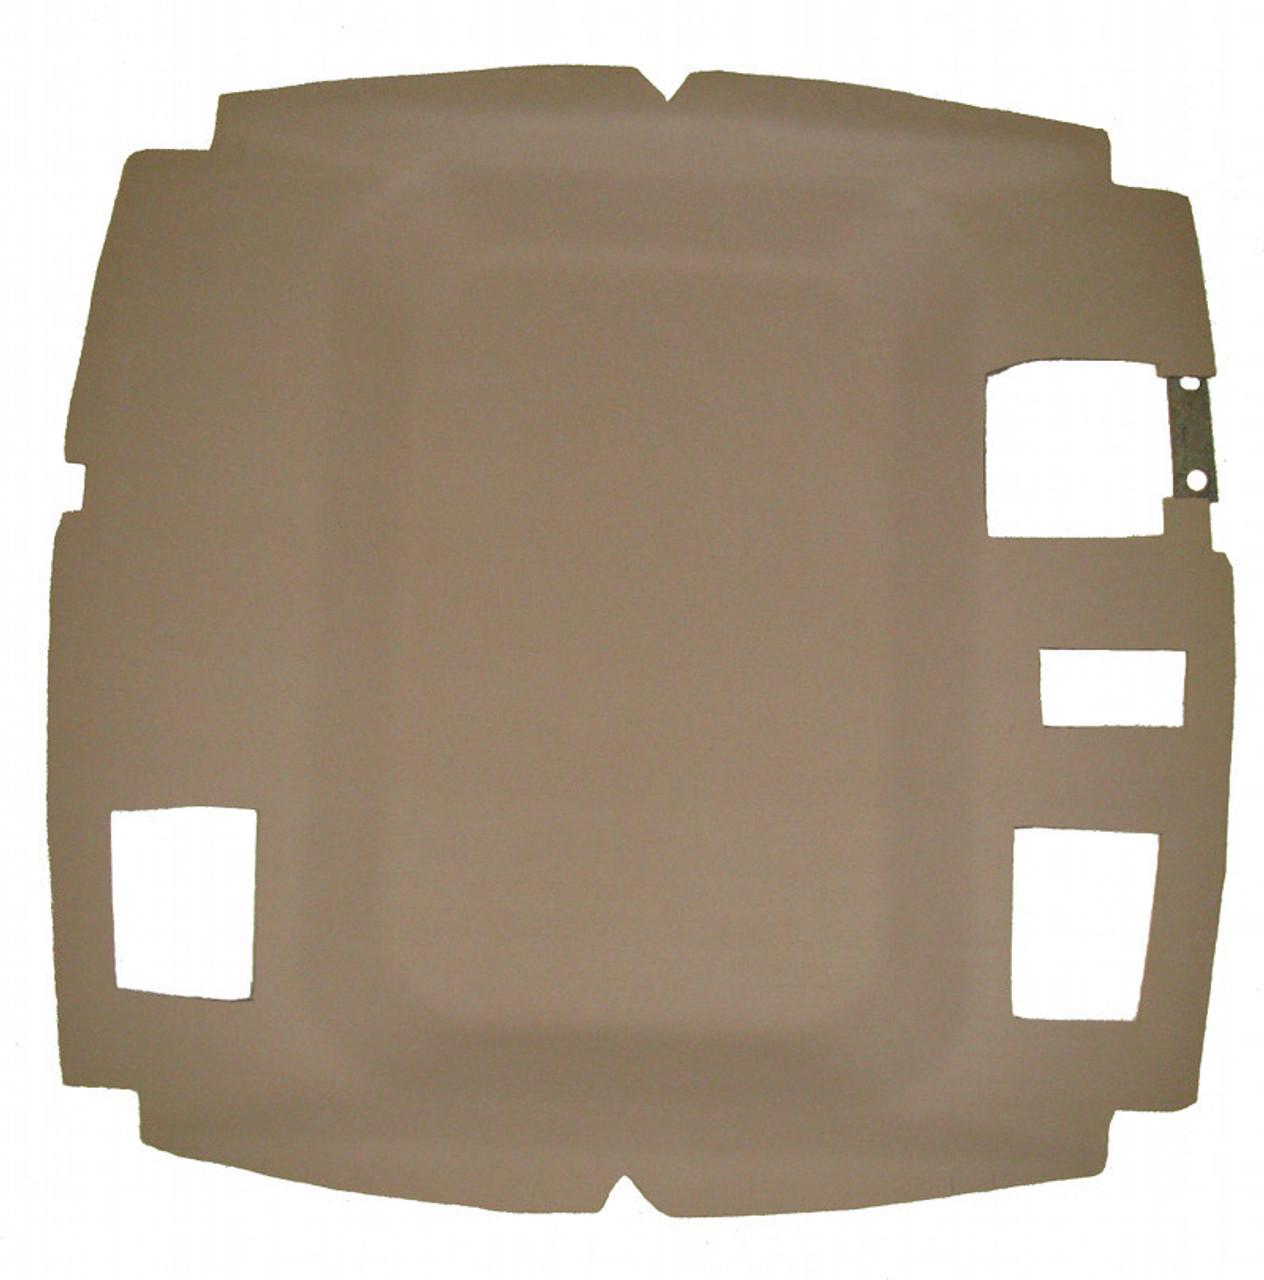 headliner for john deere 6000 series - tractor interior upholstery on john  deere 6420 wiring diagram